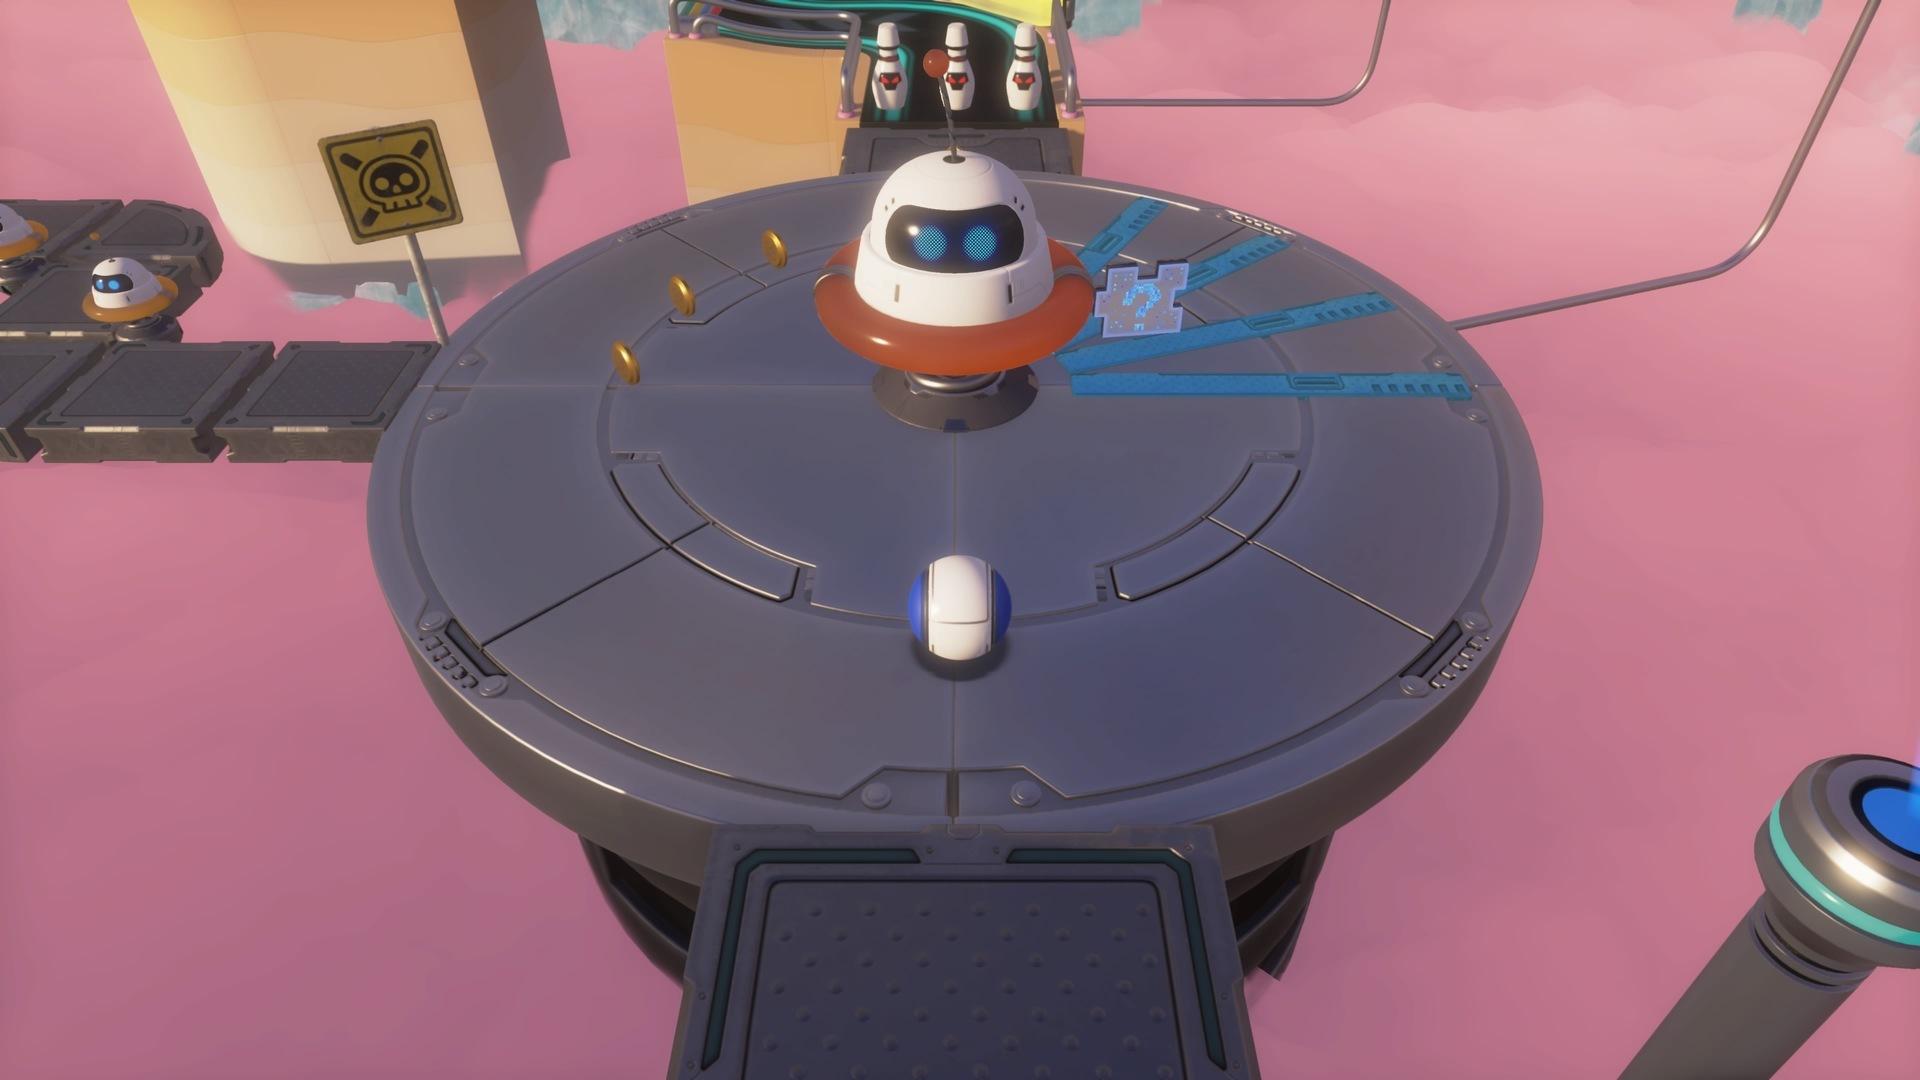 Astros Playroom® Astros Playroom® ピンボールブロードウェイ-9